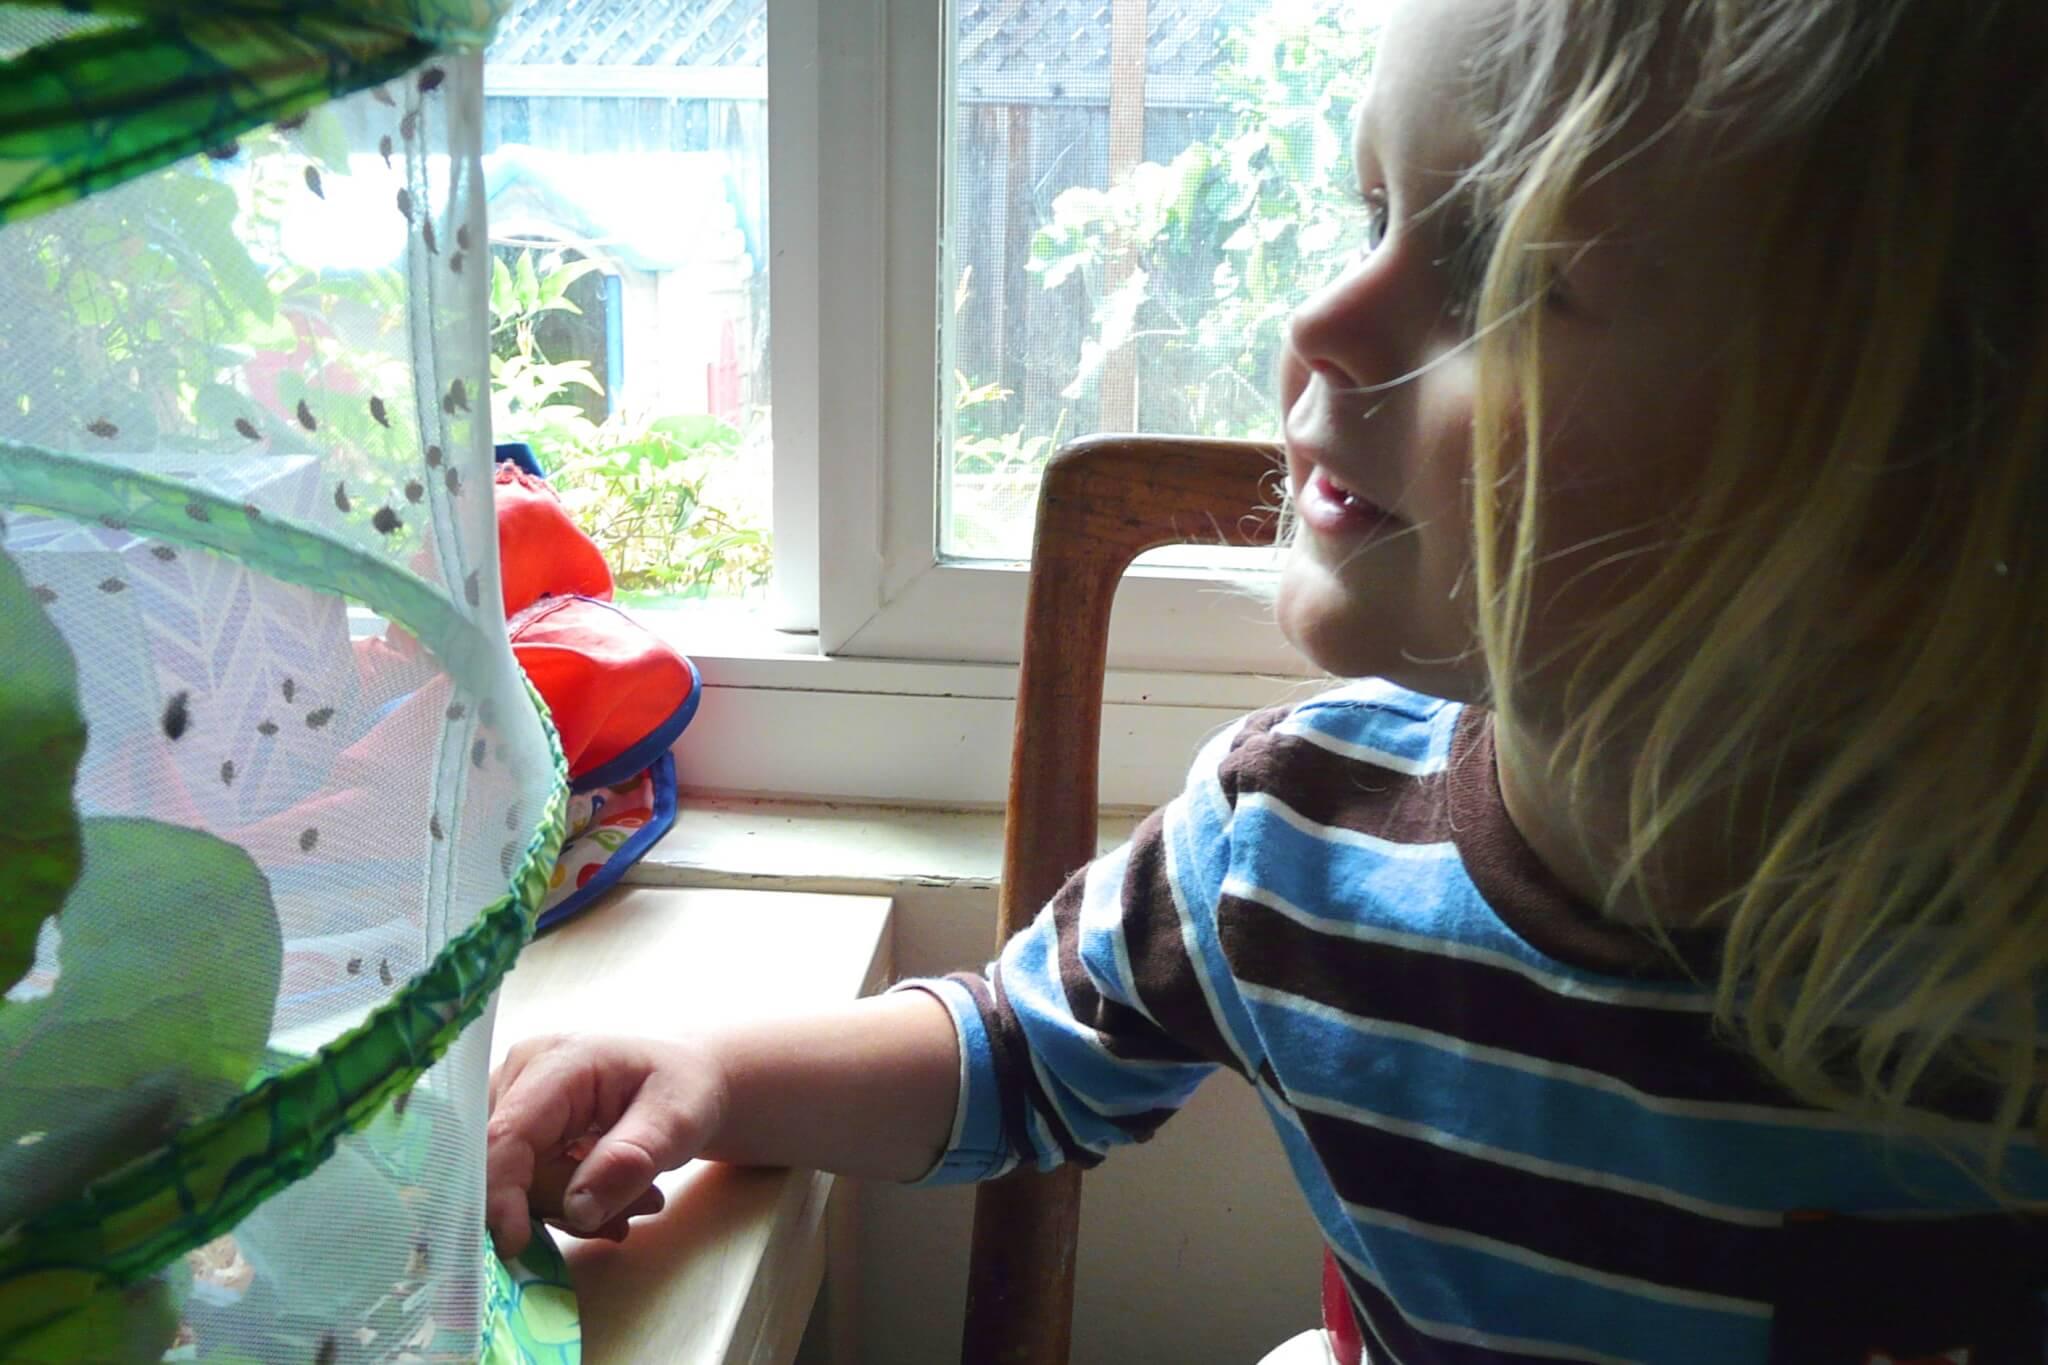 A boy smiles at his ladybug habitat.